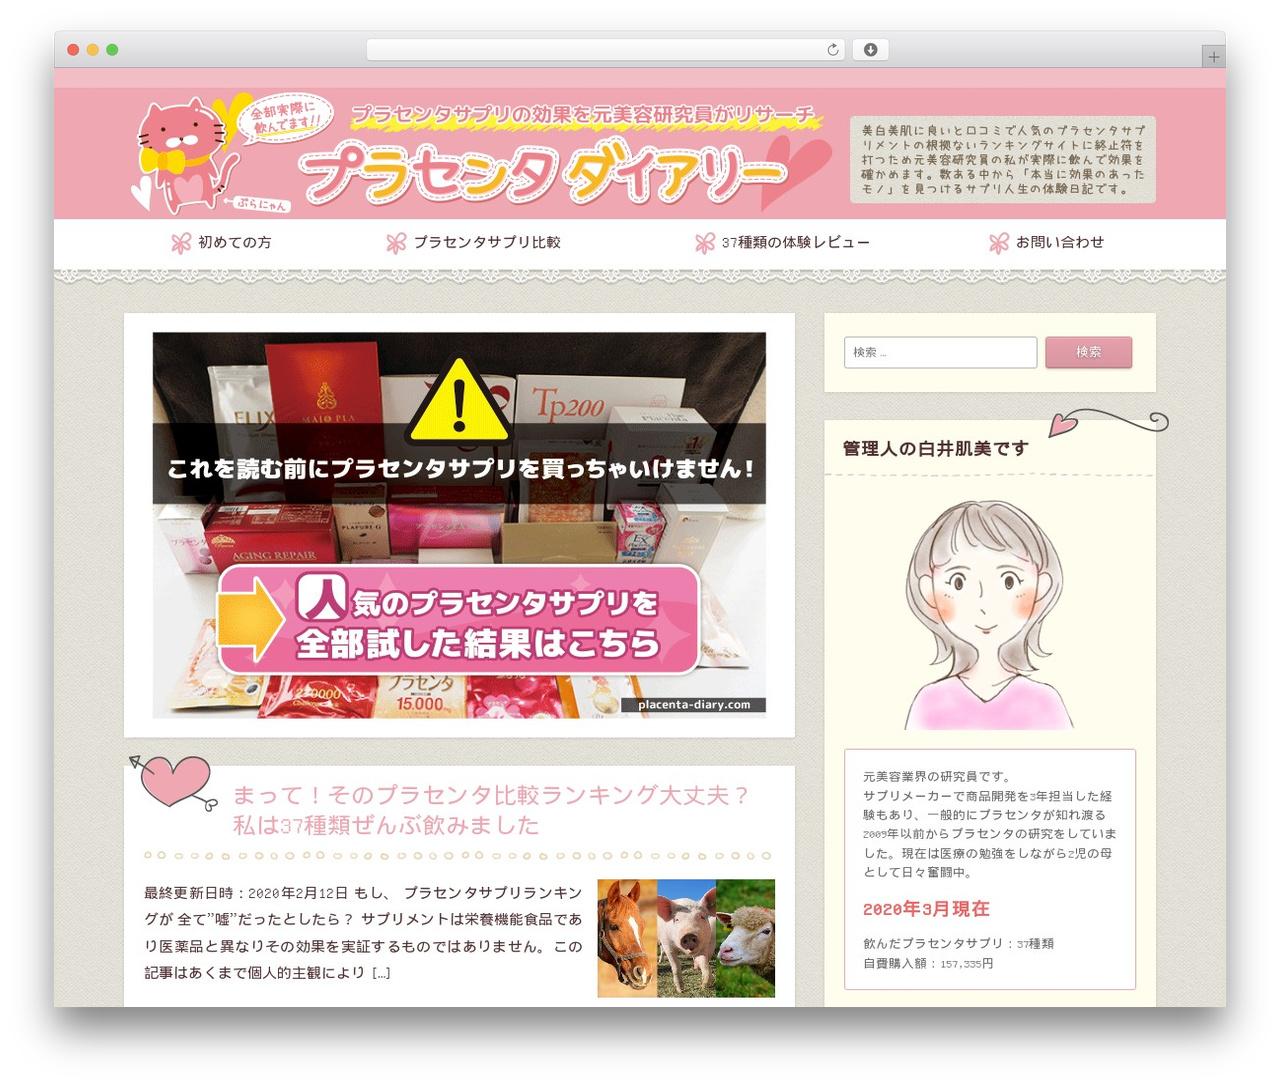 Refine Selection: Cute WordPress theme - placenta-diary.com